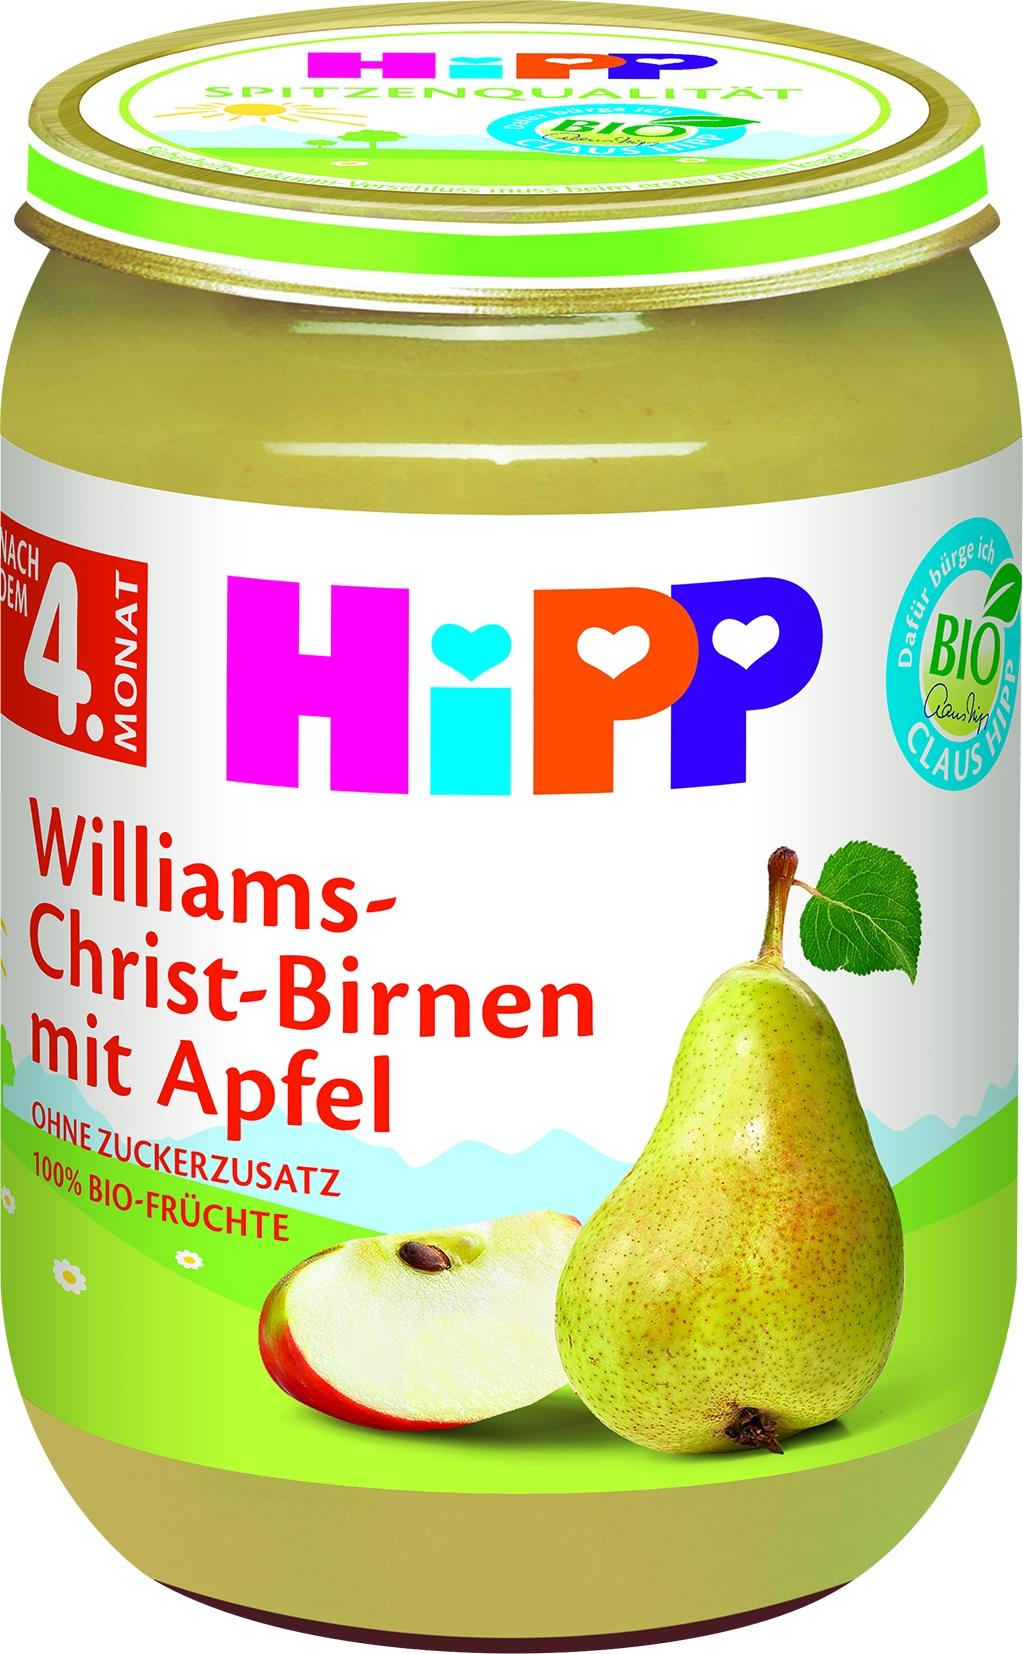 Bio 4230 Williams-Christ-Birne